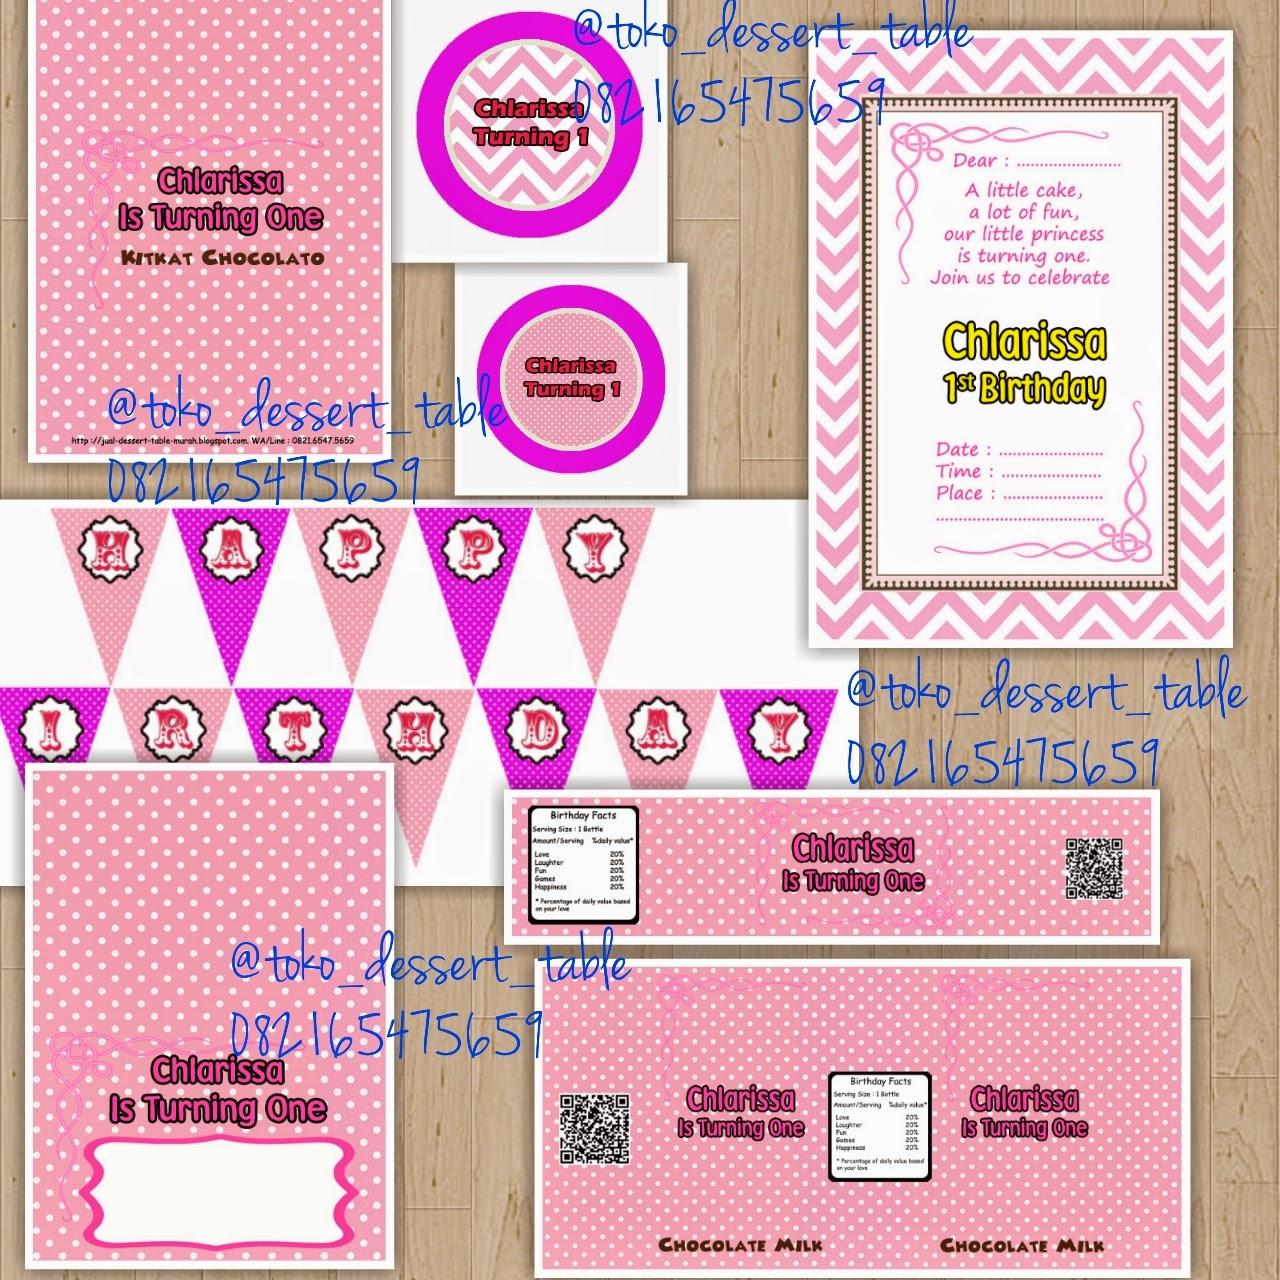 Toko Dessert Table Printable Part 2